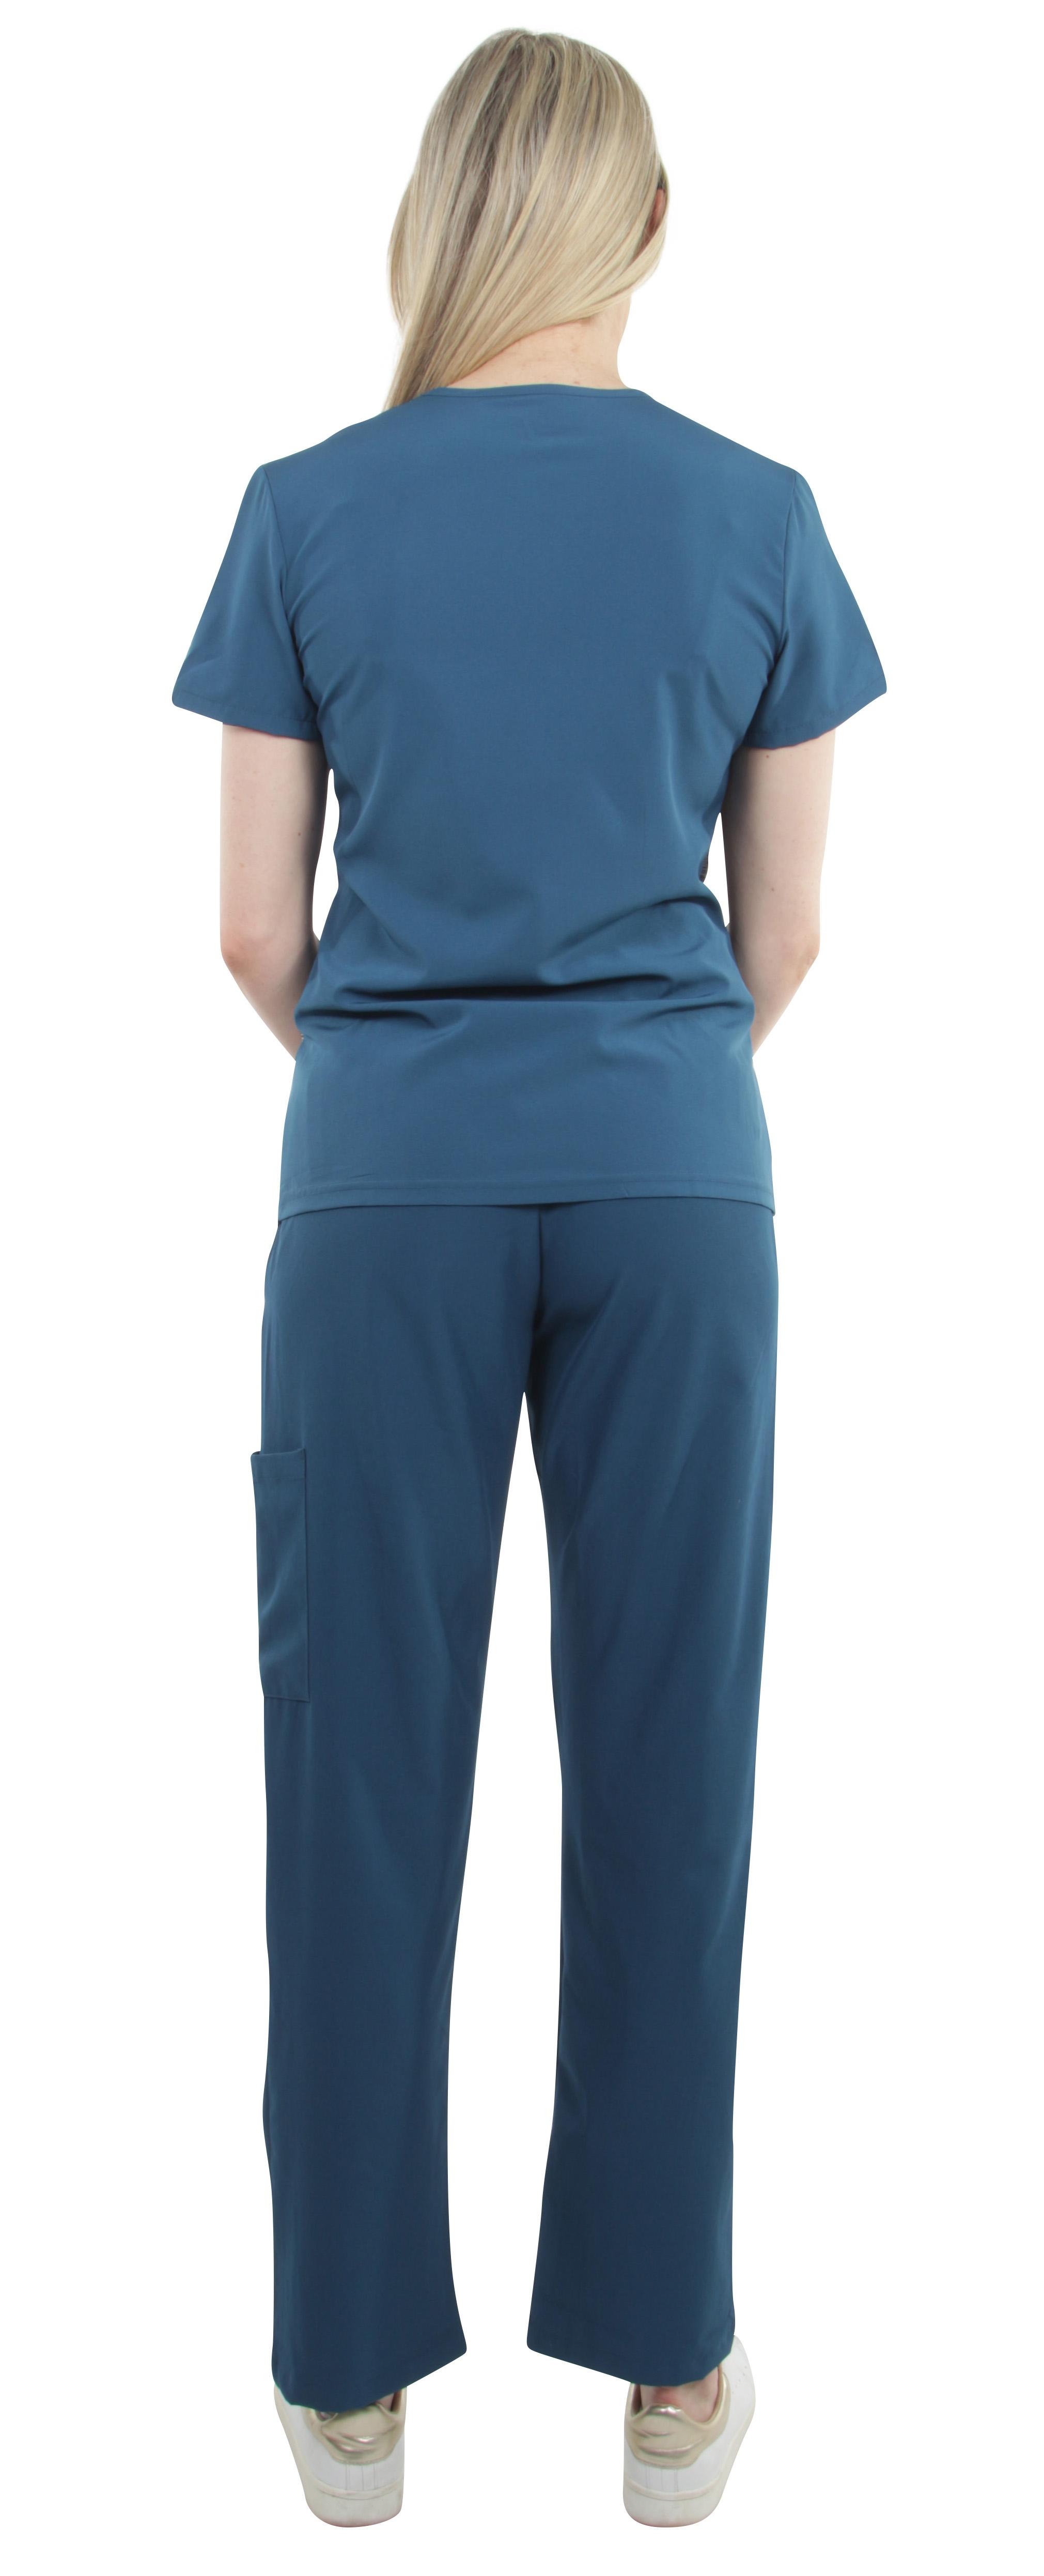 Unisex-Performance-Stretch-Medical-Uniform-Five-Pockets-V-Neck-Scrubs-Sets miniature 21